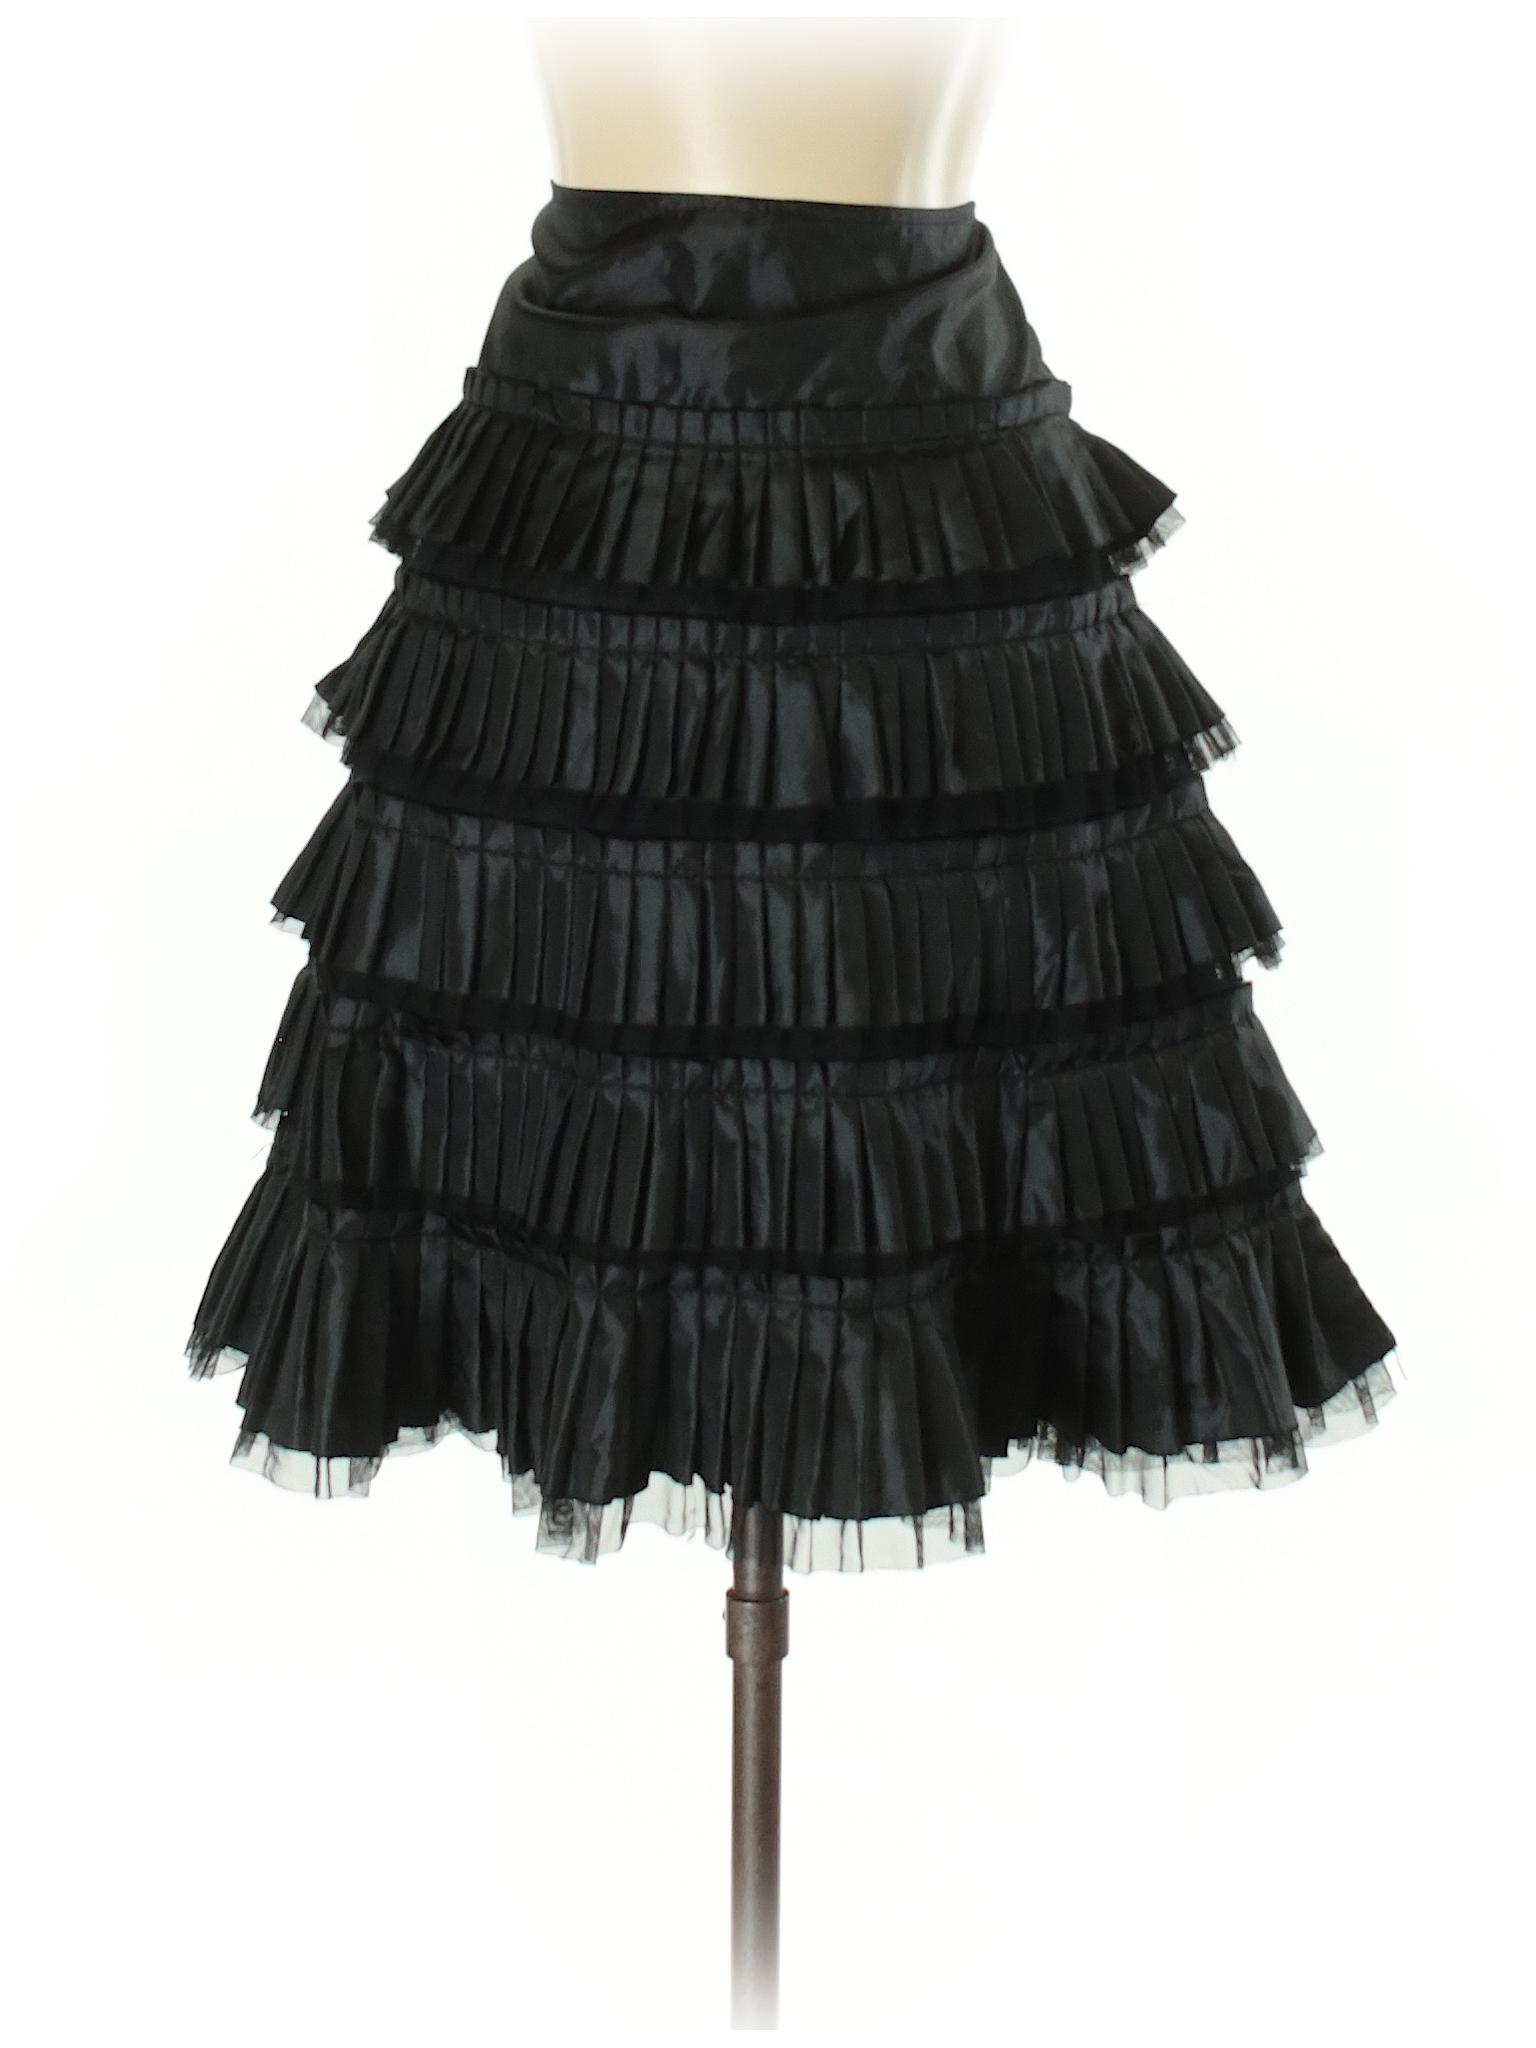 Skirt Casual Boutique Skirt Skirt Casual Skirt Casual Boutique Casual Casual Boutique Boutique Boutique Skirt Casual Boutique Skirt XxwqRAwC